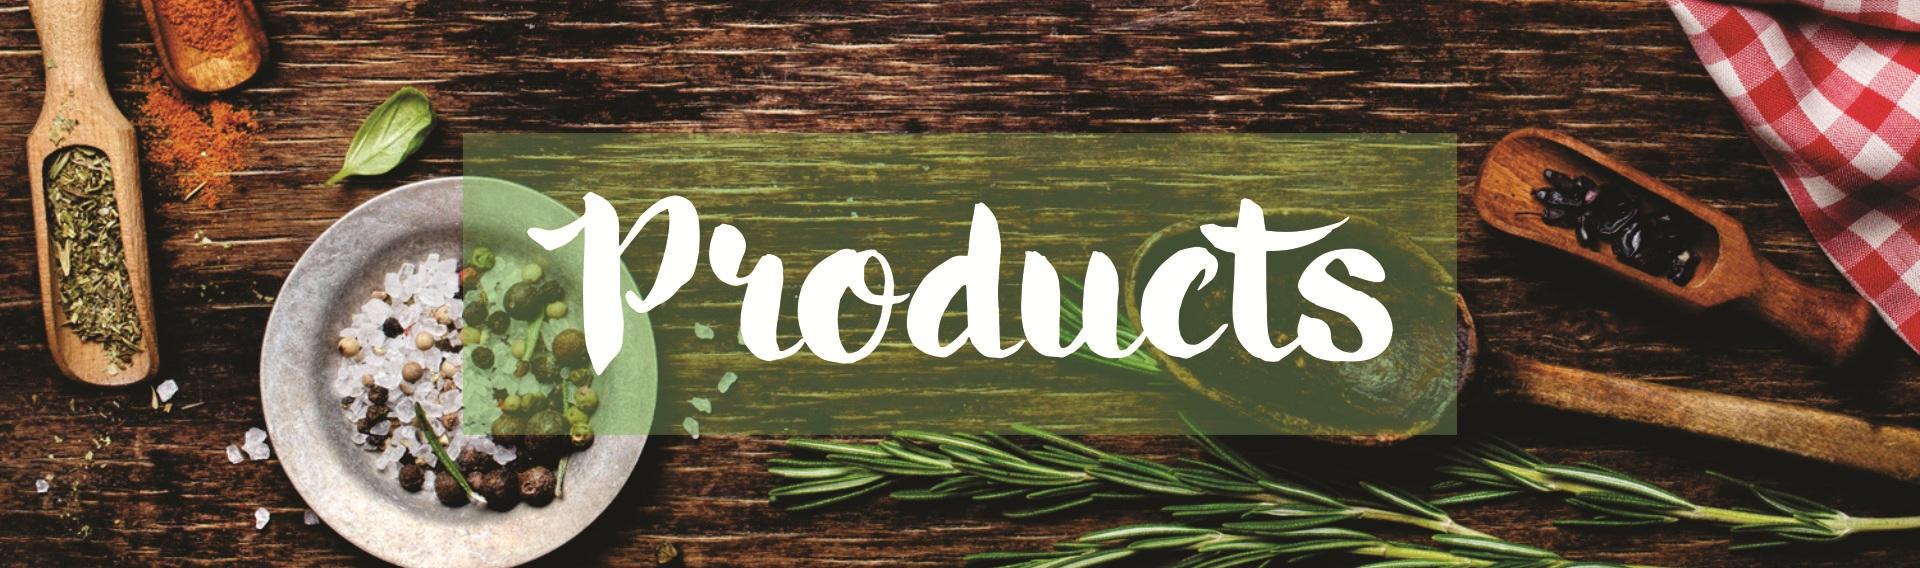 products range suruchi spices